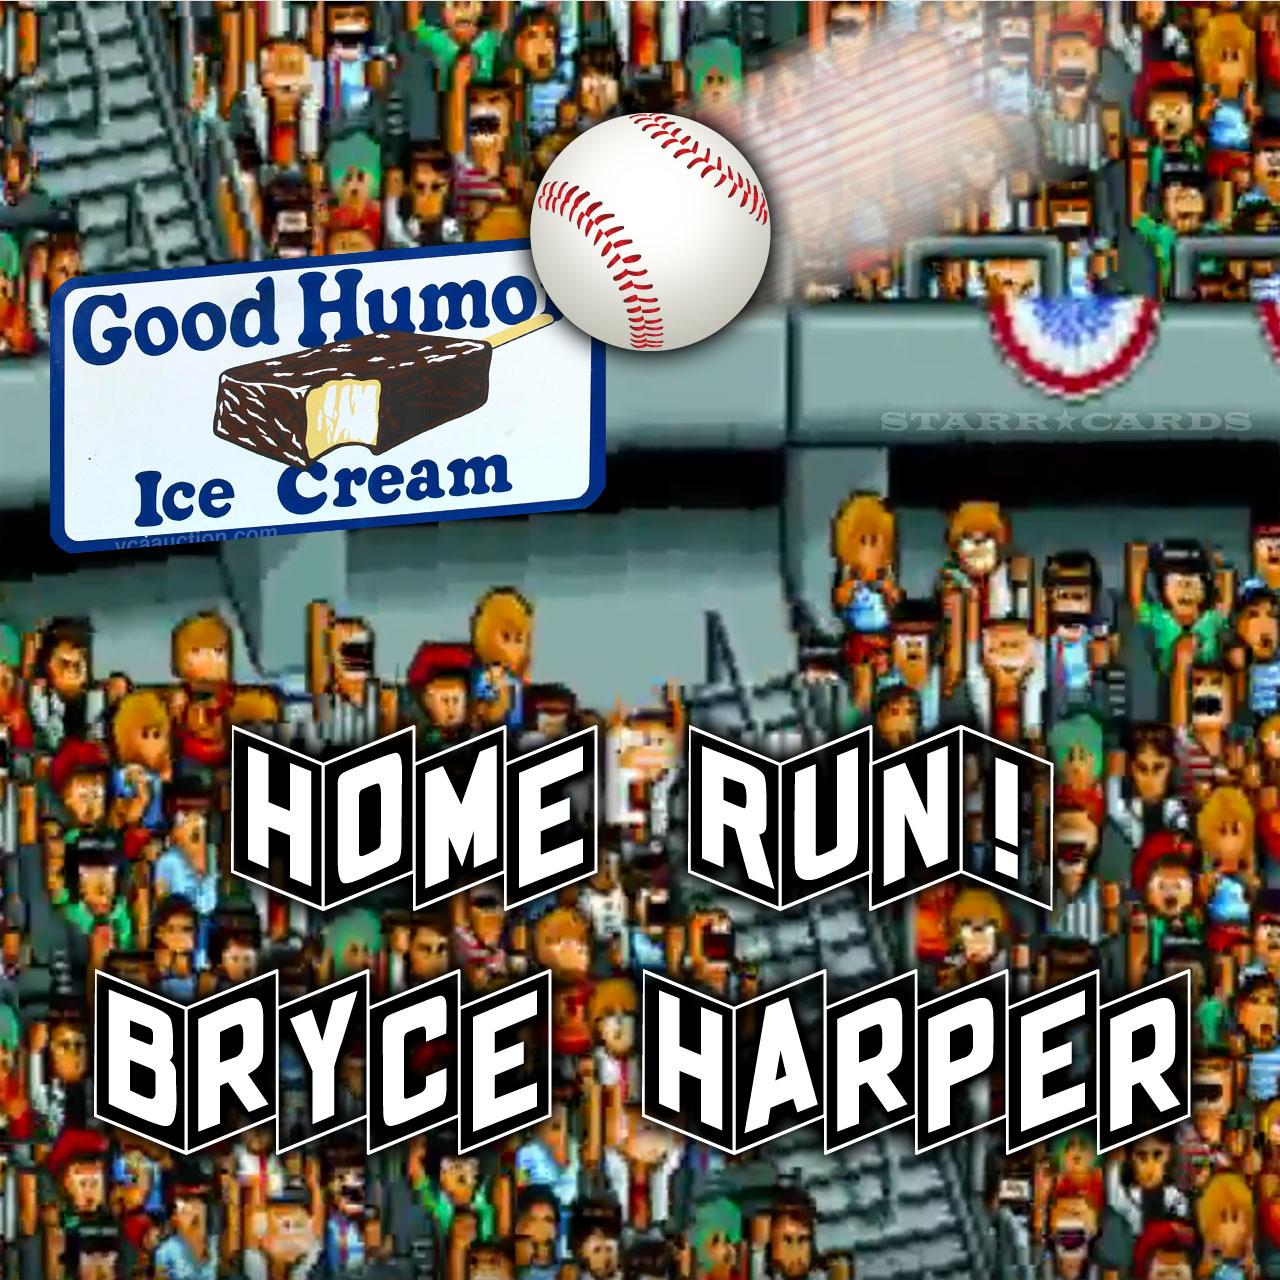 Grand Slam! Bryce Harper hits 100th HR off of Good Humor sign